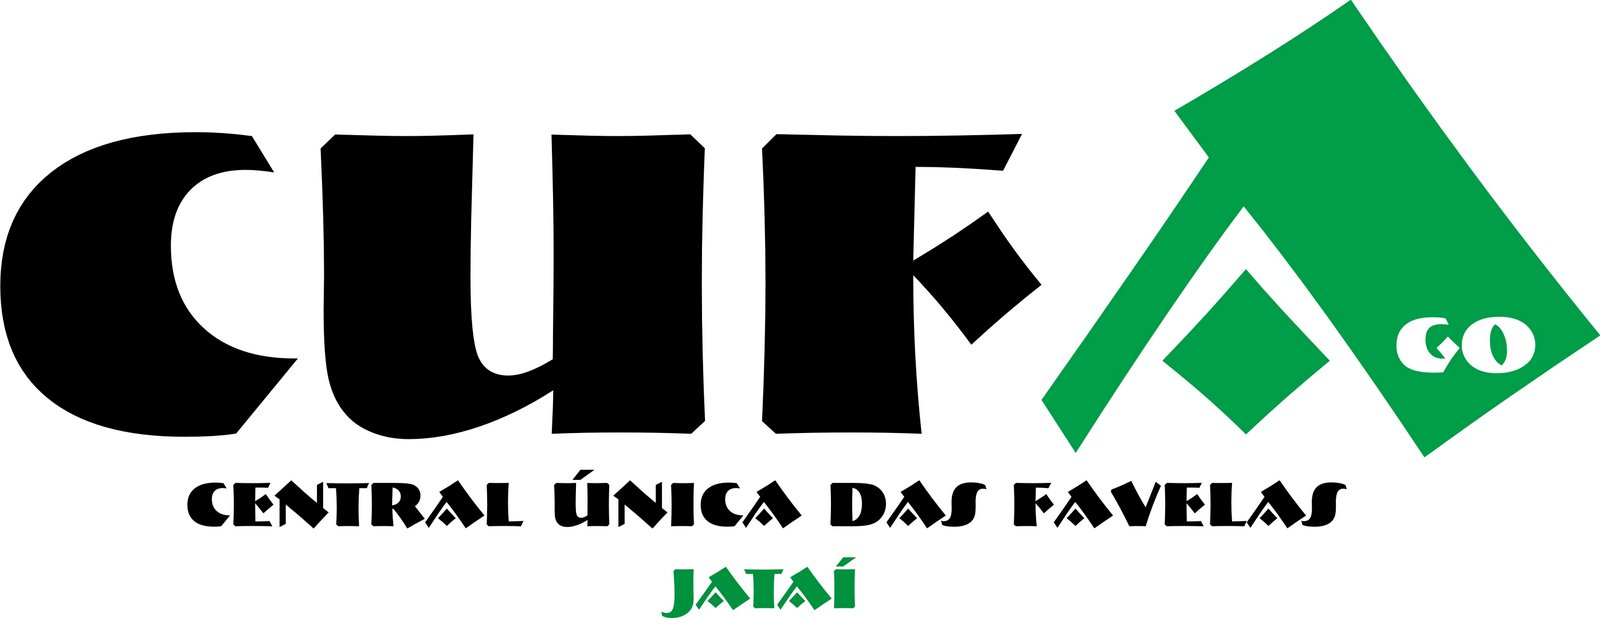 CUFA Jataí